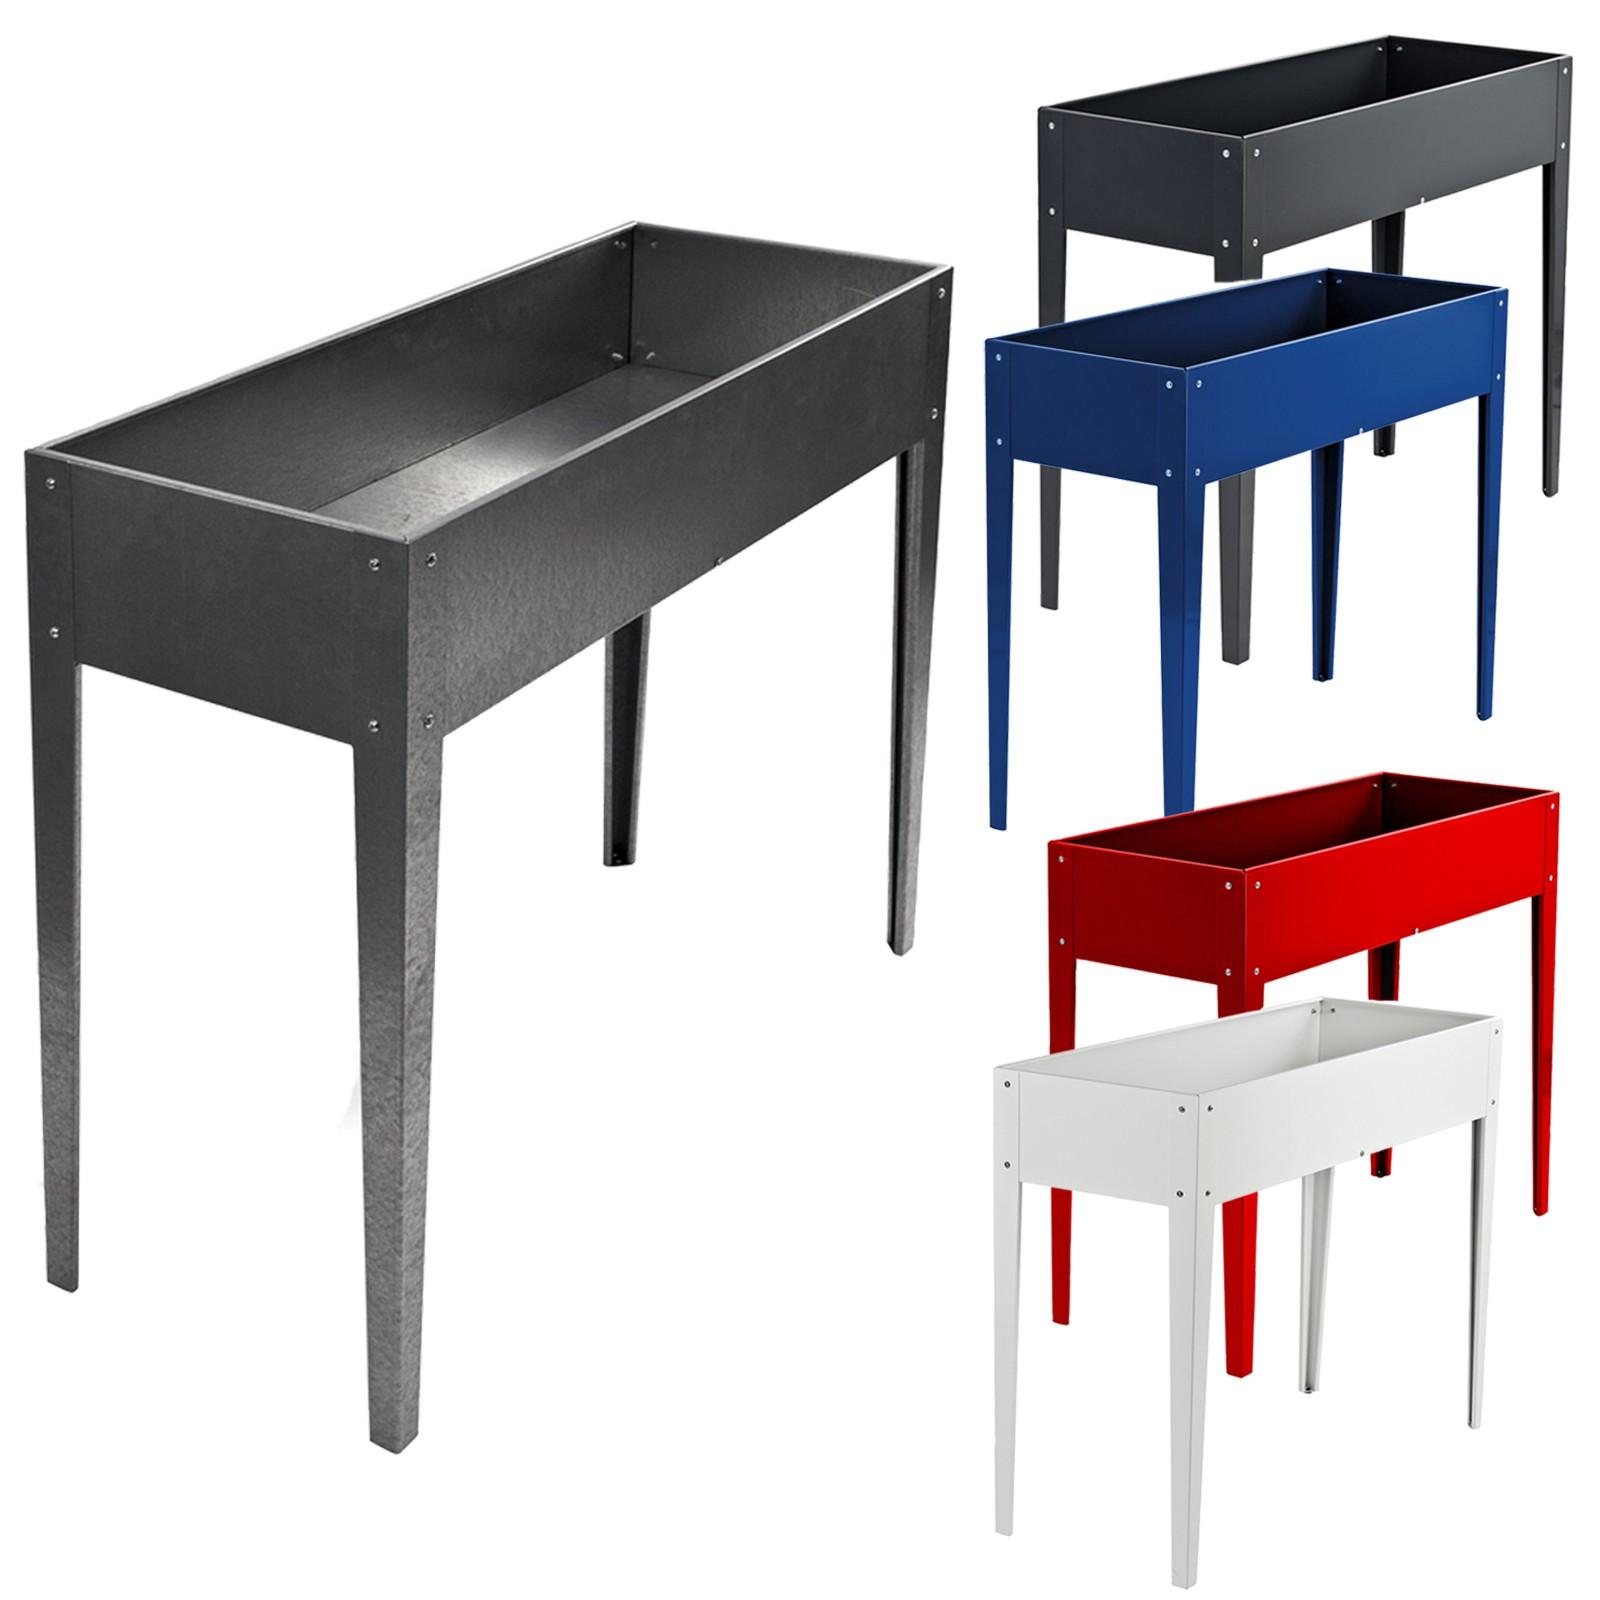 metall hochbeet t bingen gartenbeet gem sebeet pflanzenbeet 100x41x84 5 cm ebay. Black Bedroom Furniture Sets. Home Design Ideas